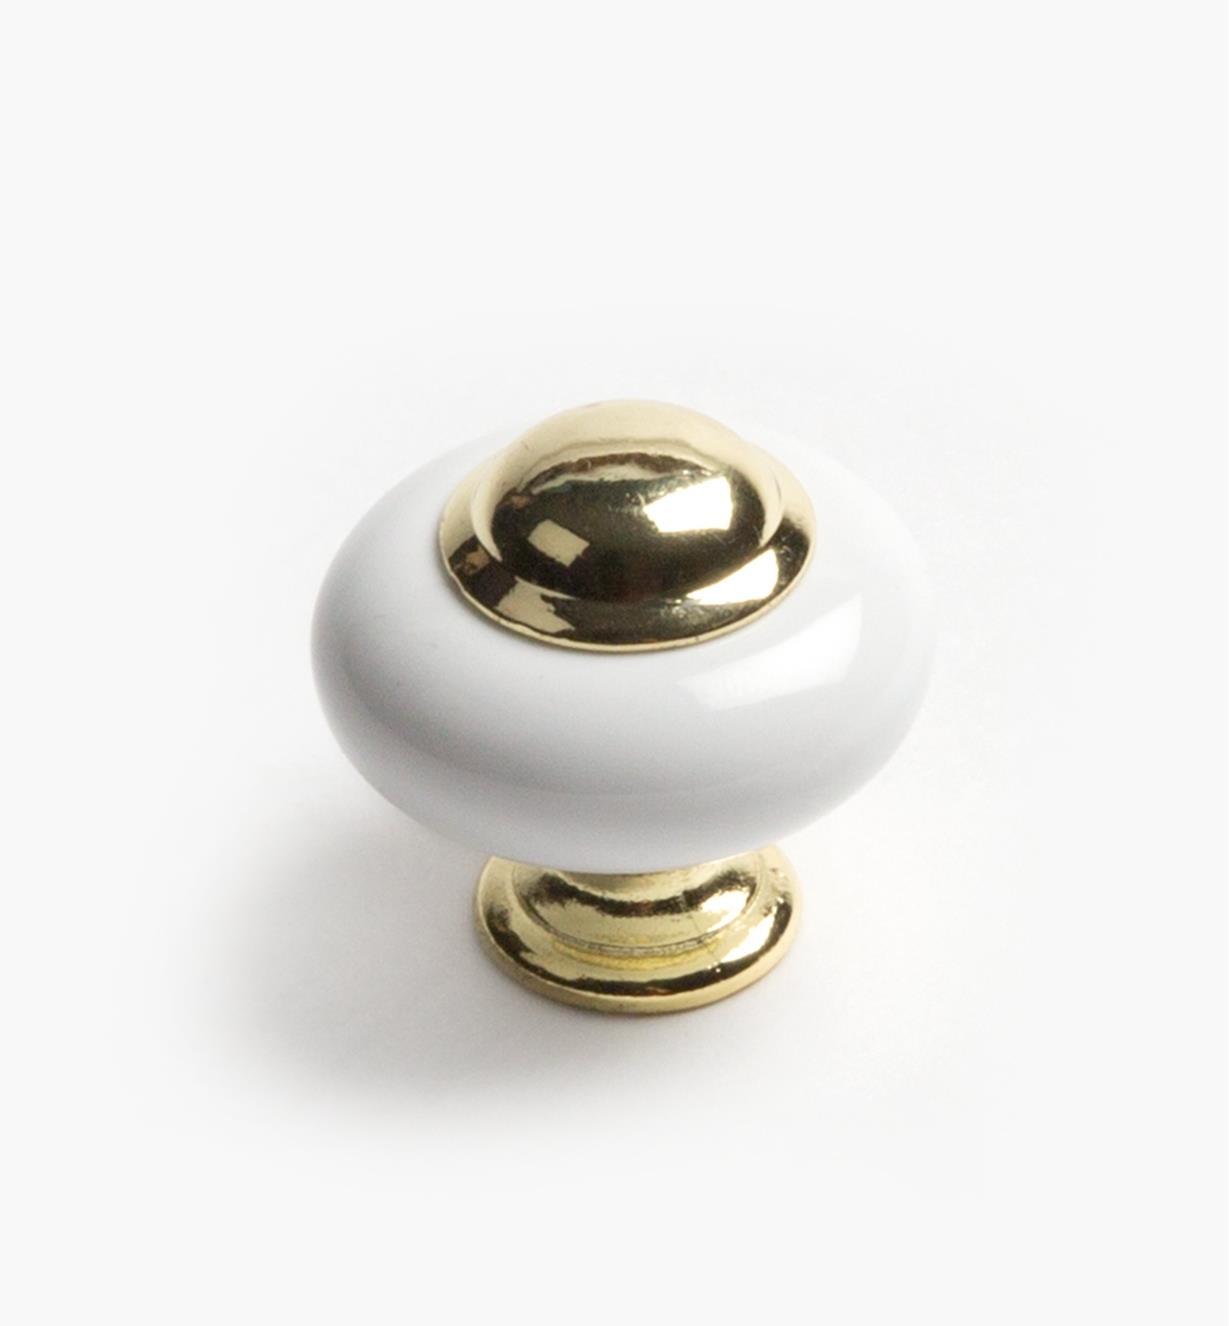 "03W1615 - 1 1/4"" × 1 1/8"" Ultra-Brass & Porcelain Knob, ea."